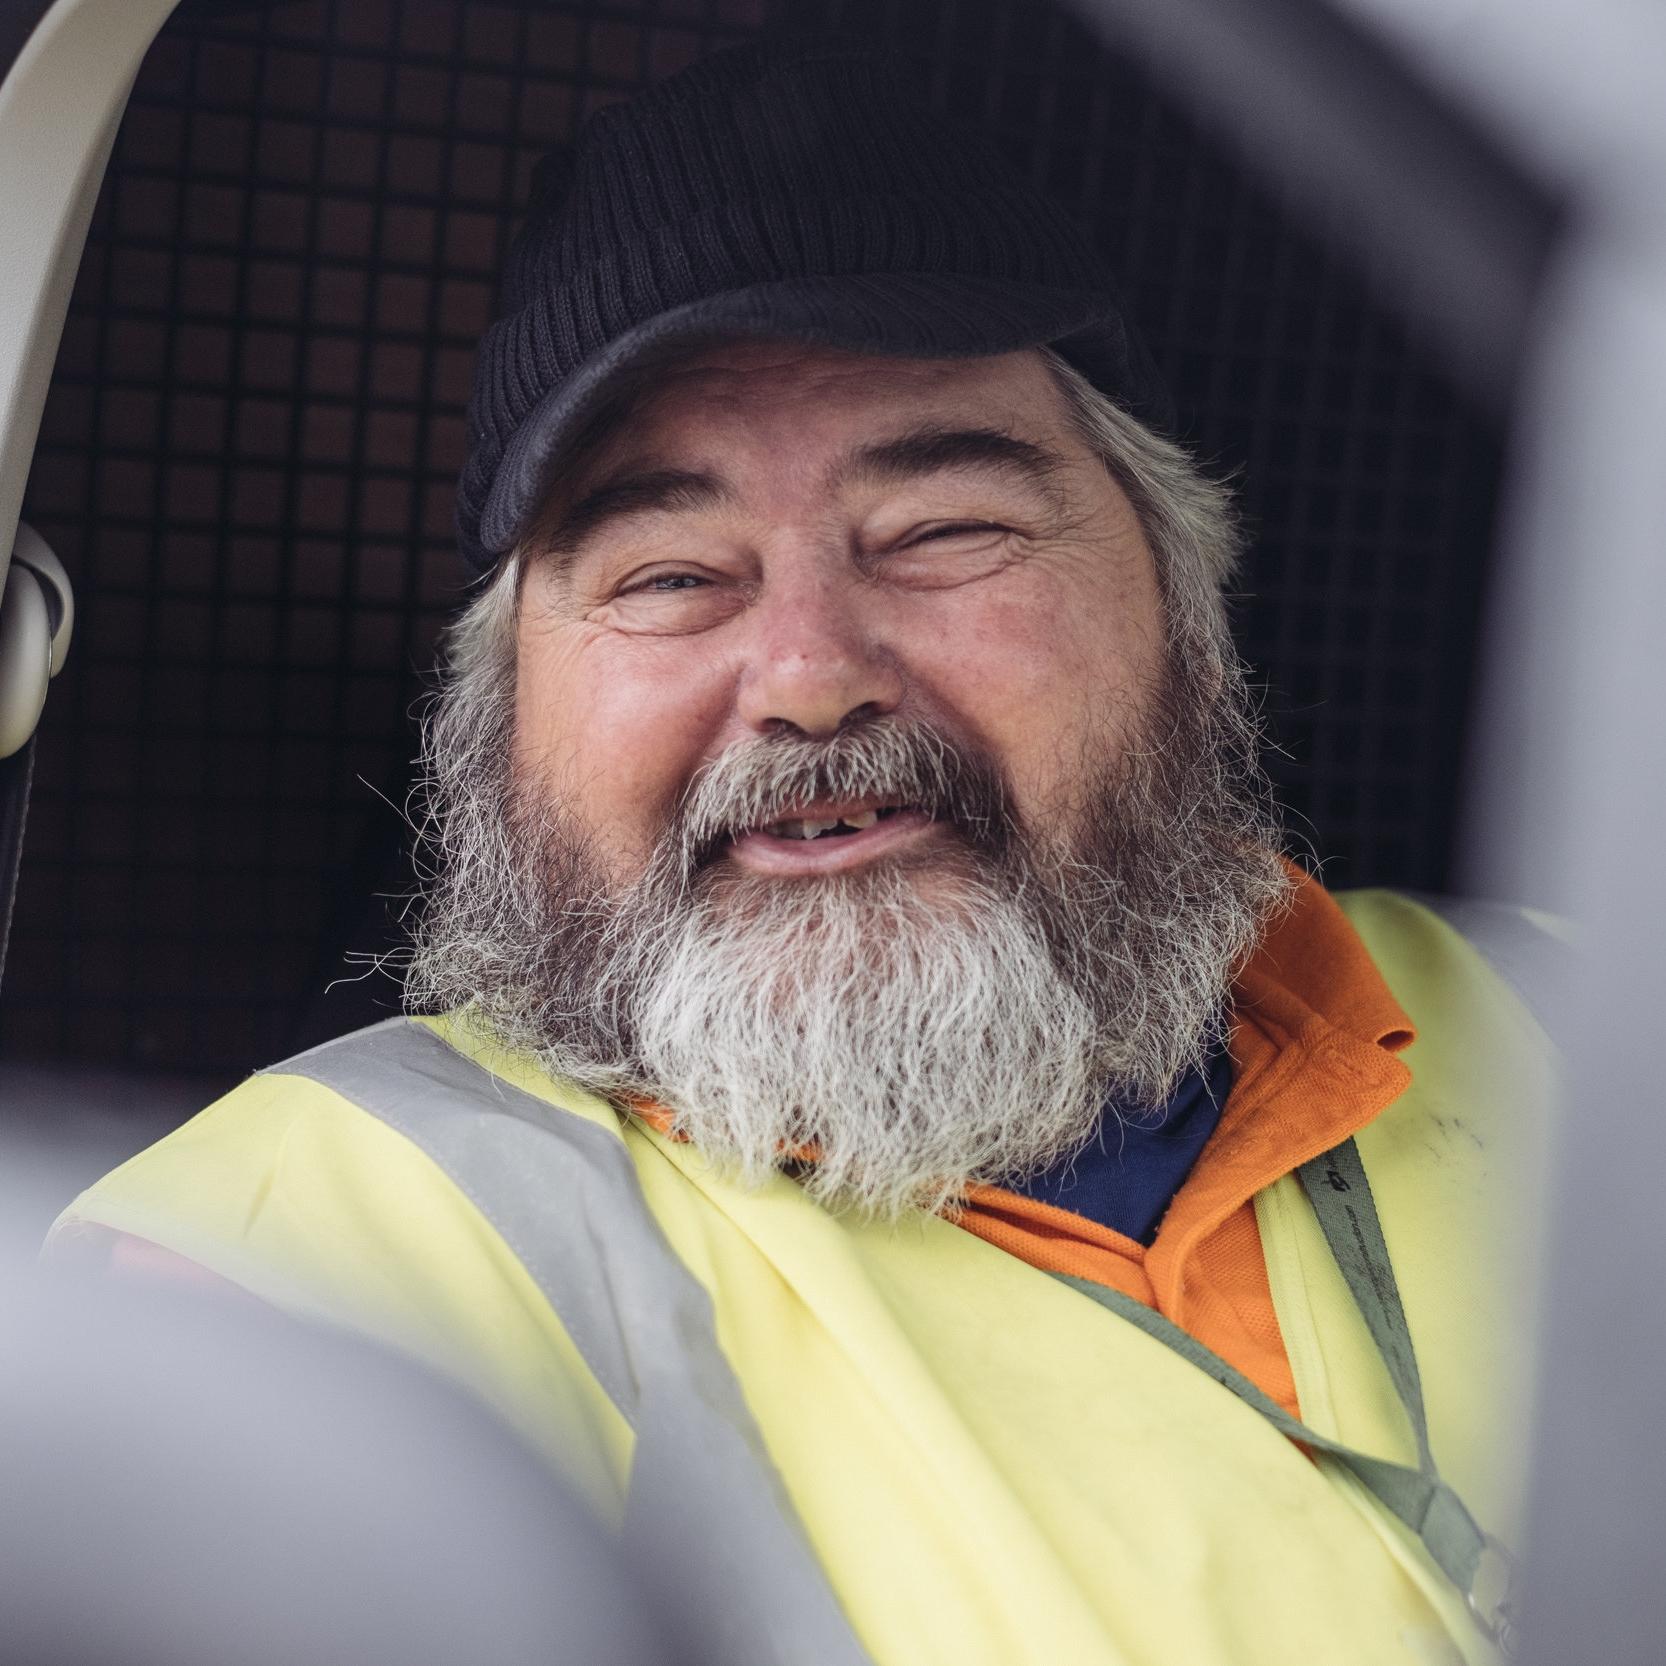 Anthony - Machine driver